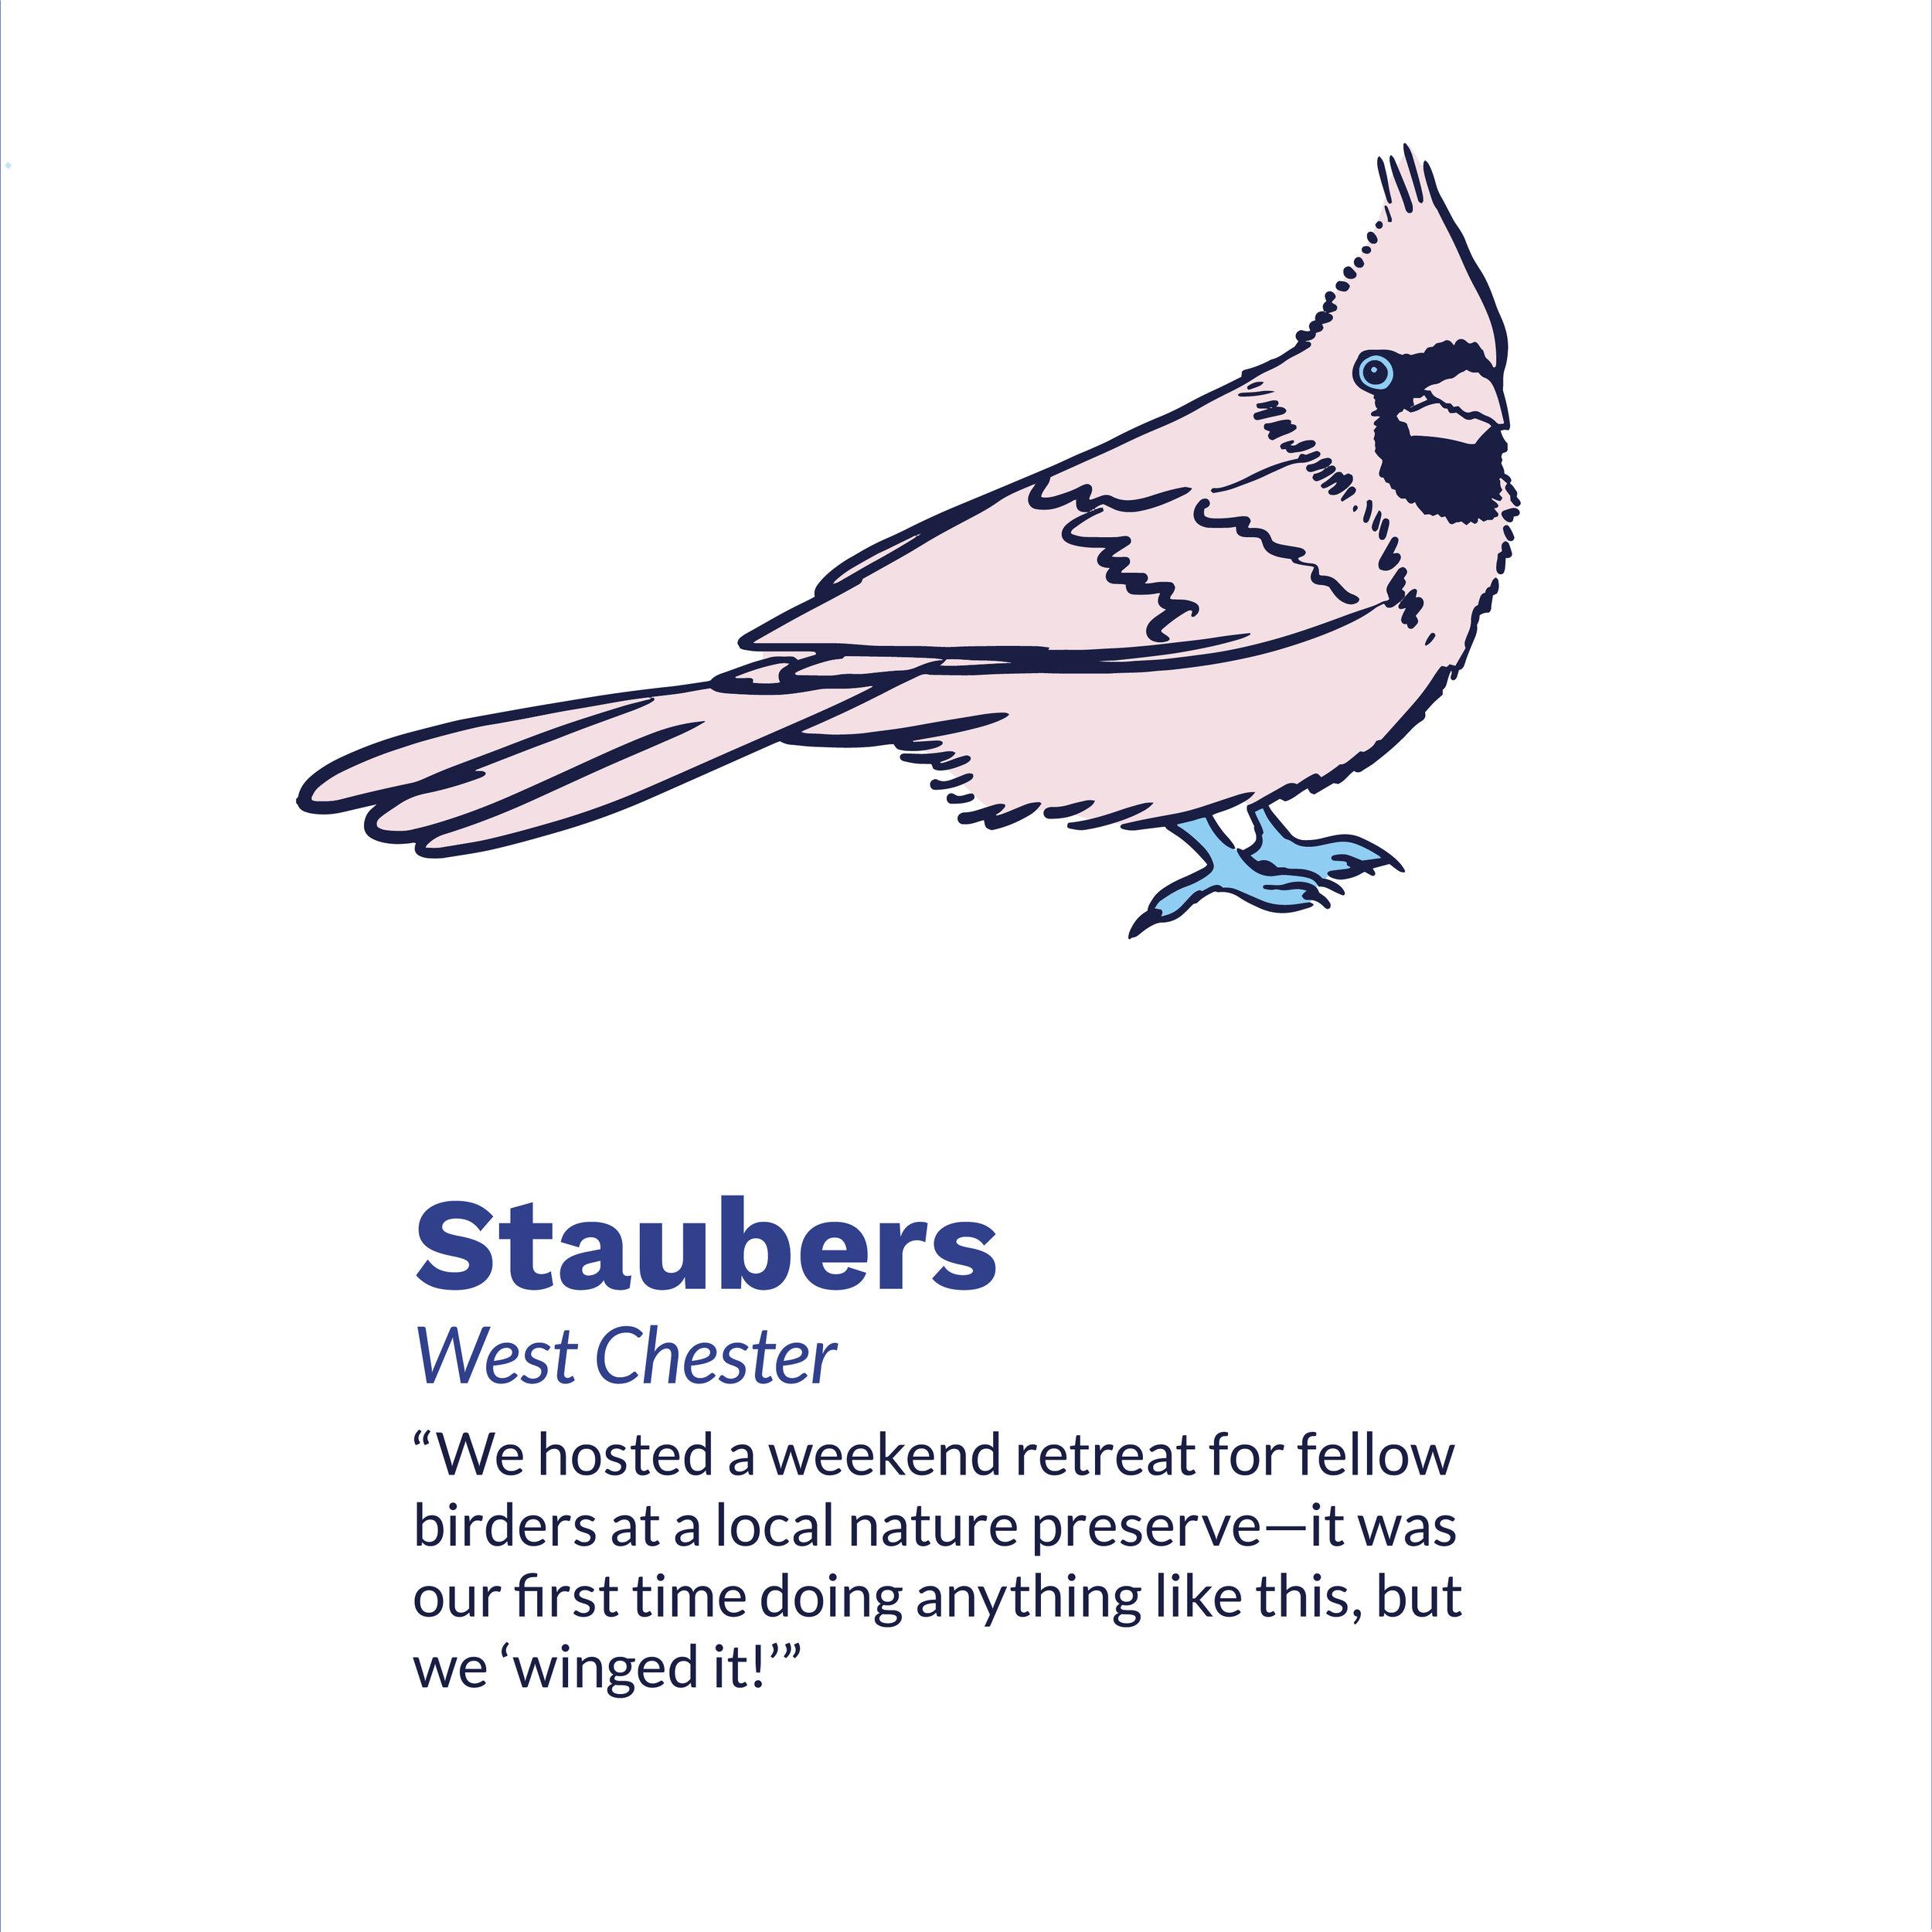 Staubers_INSTAGRAM 1800 X 1800 C.jpg